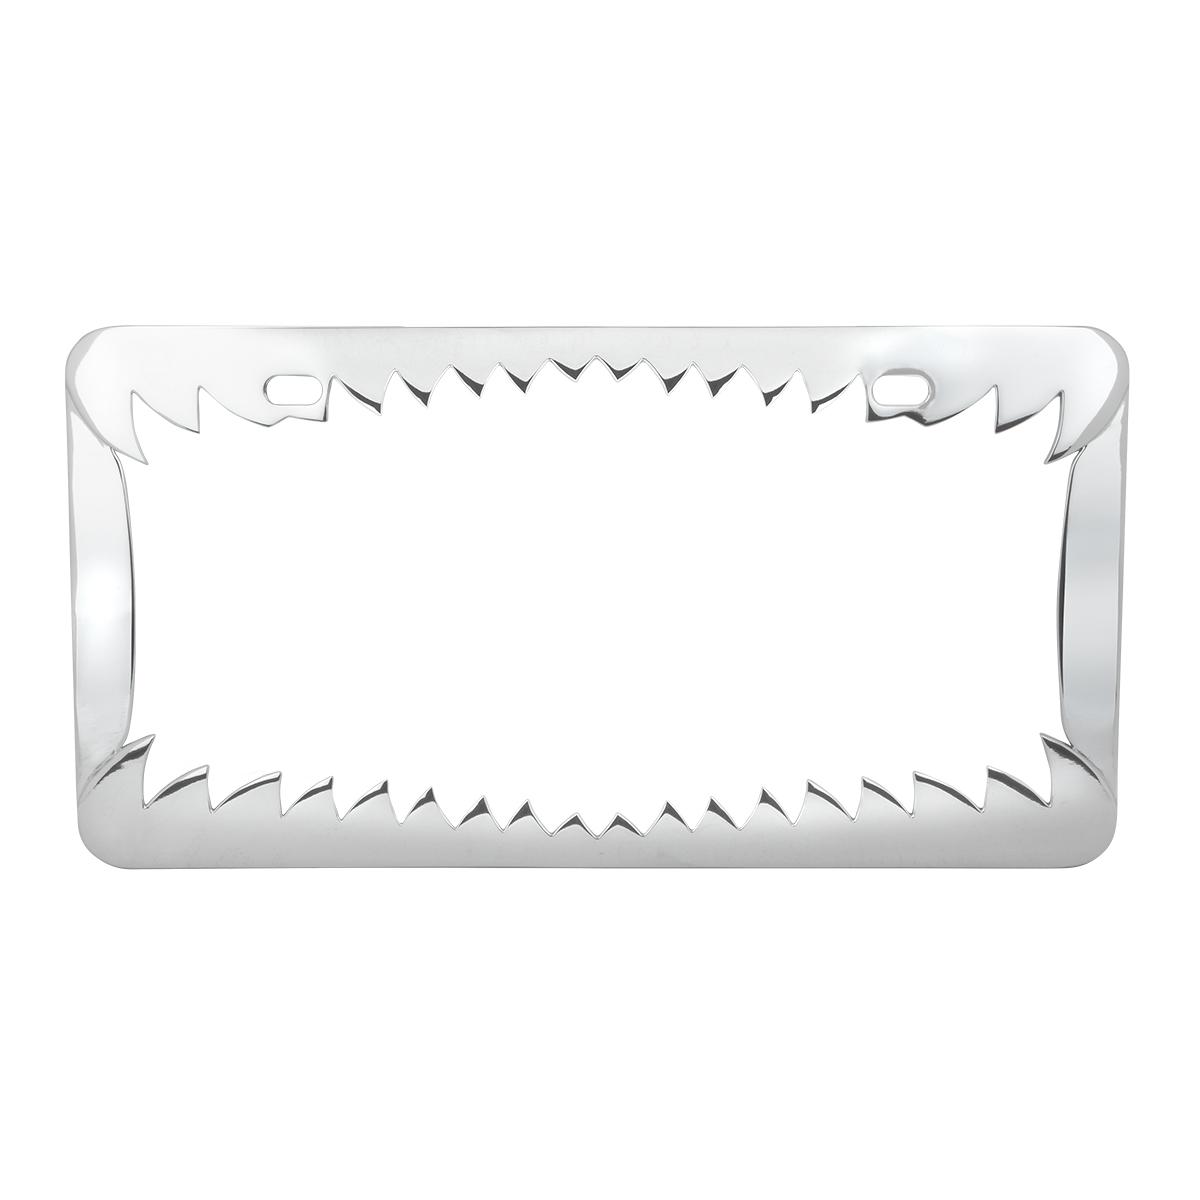 60461 Shark Teeth License Plate Frame